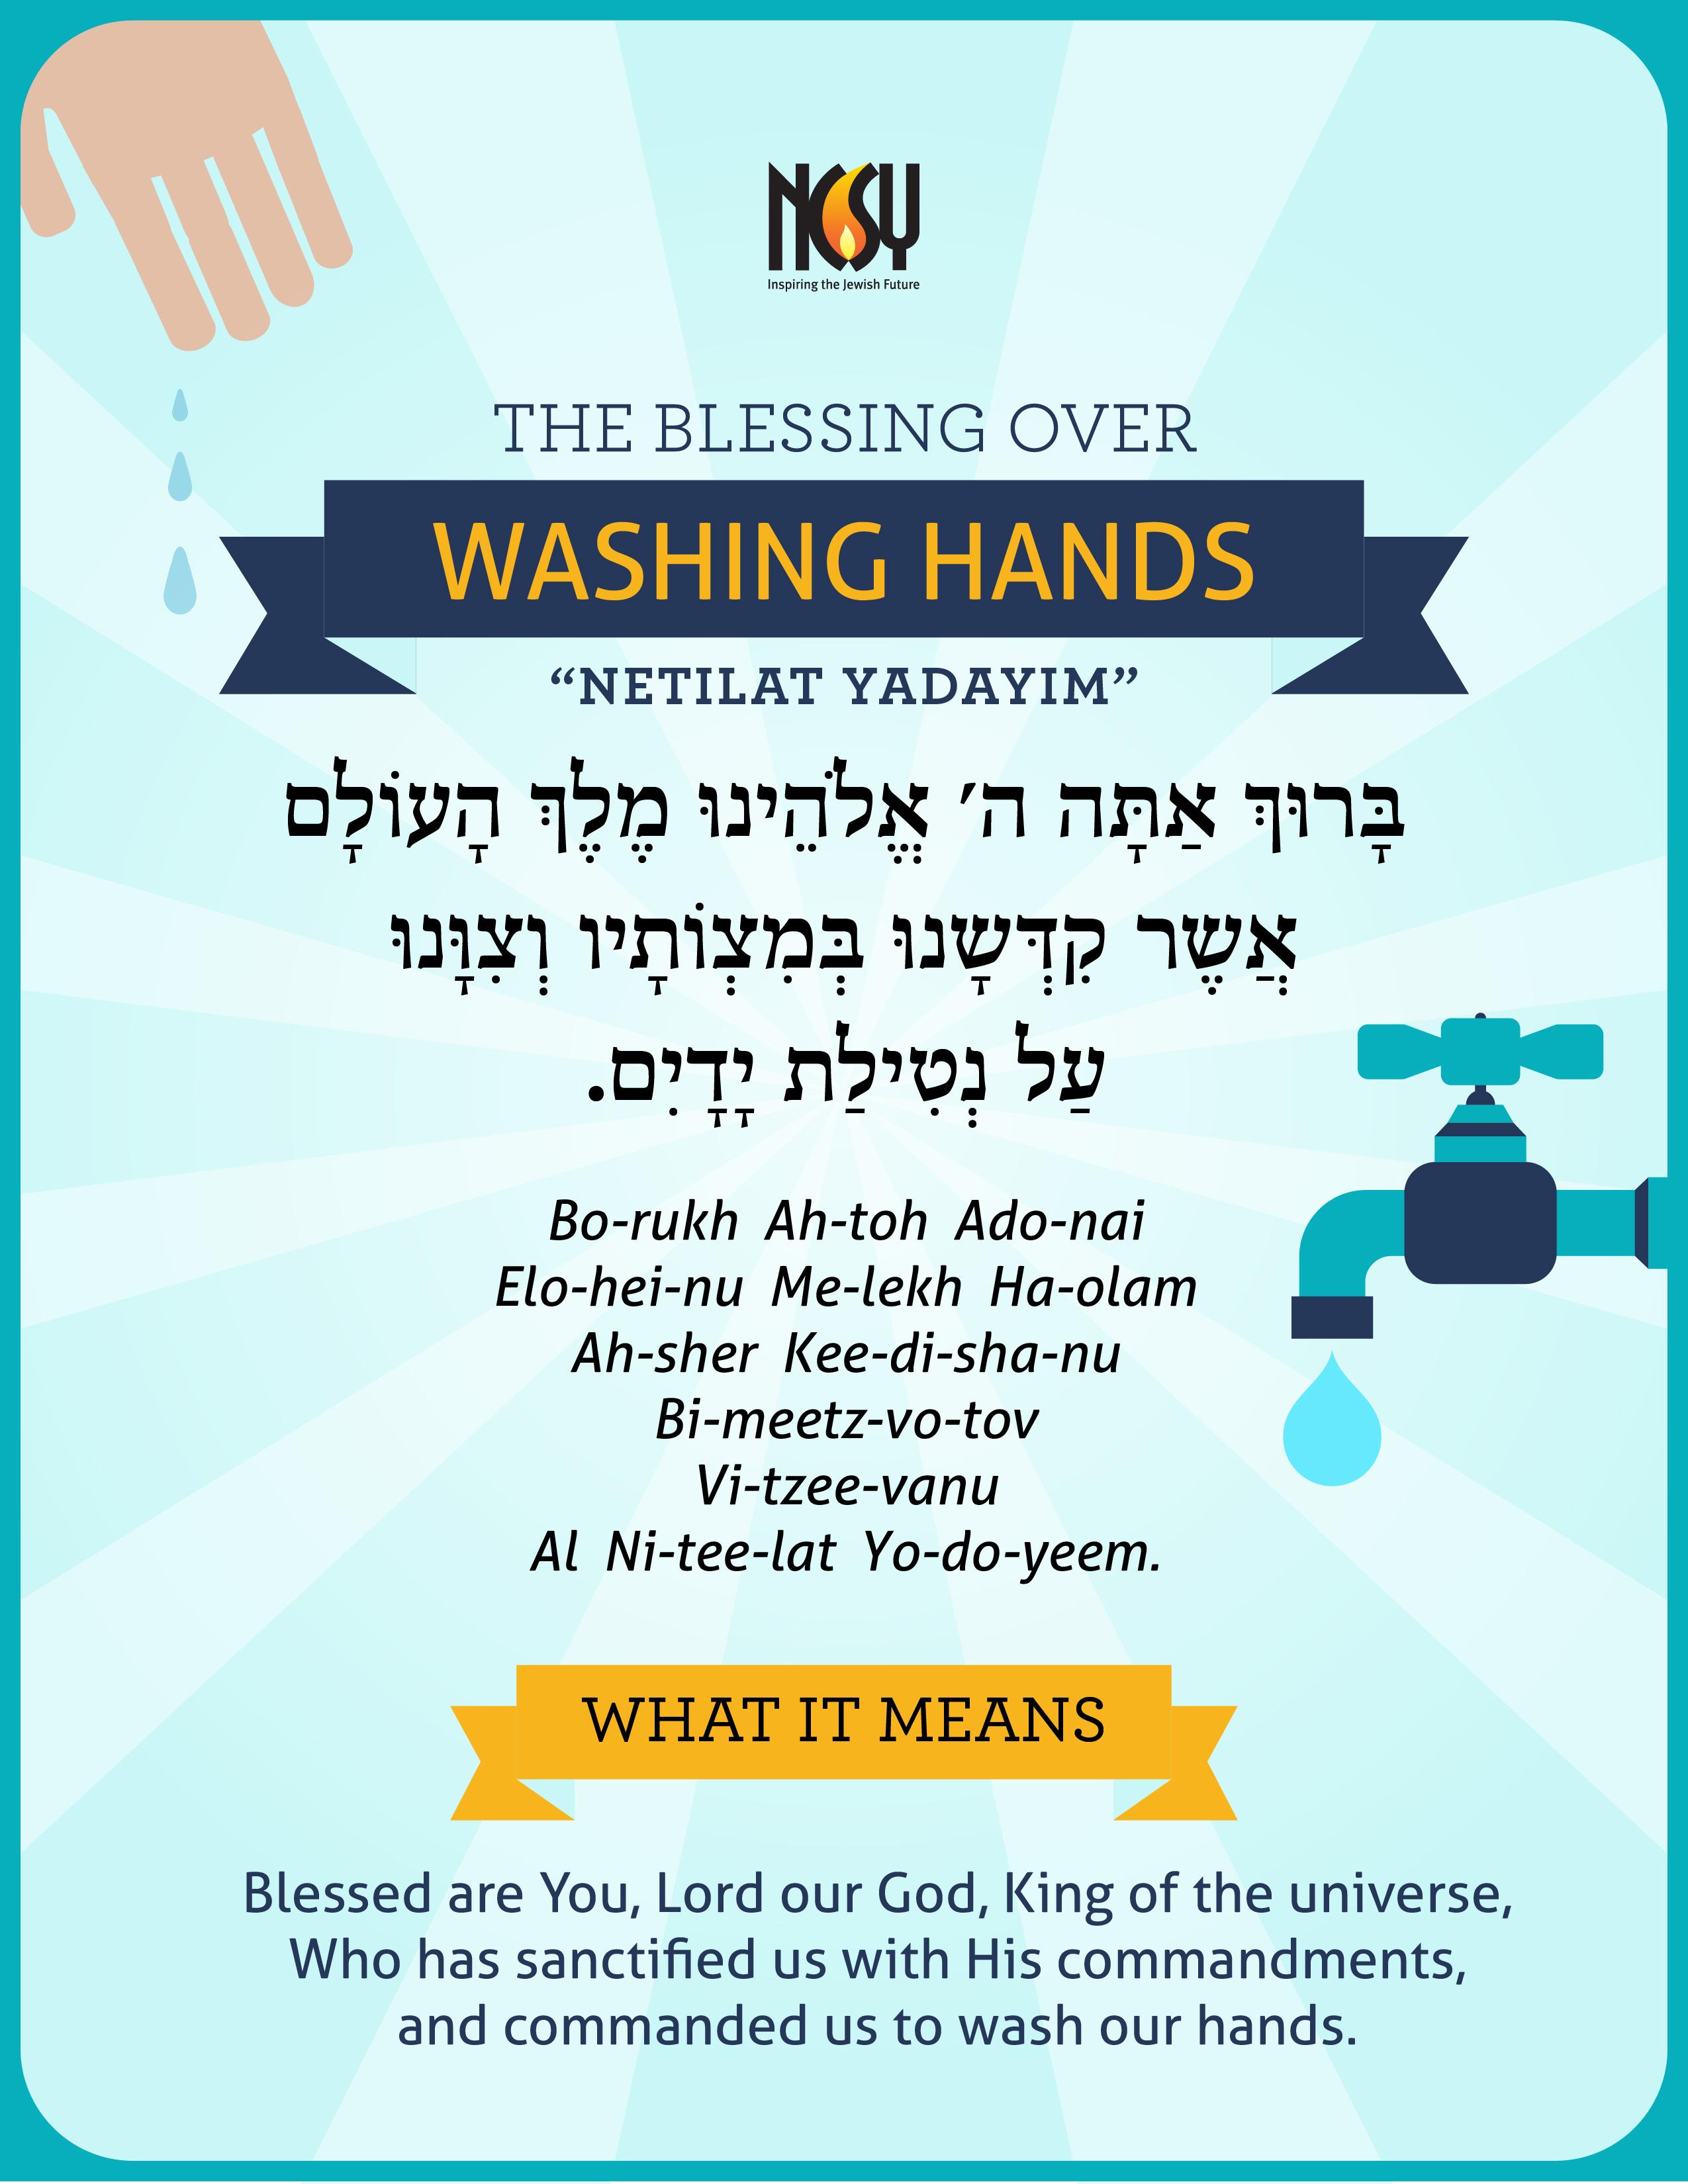 How to Perform Netilat Yadayim